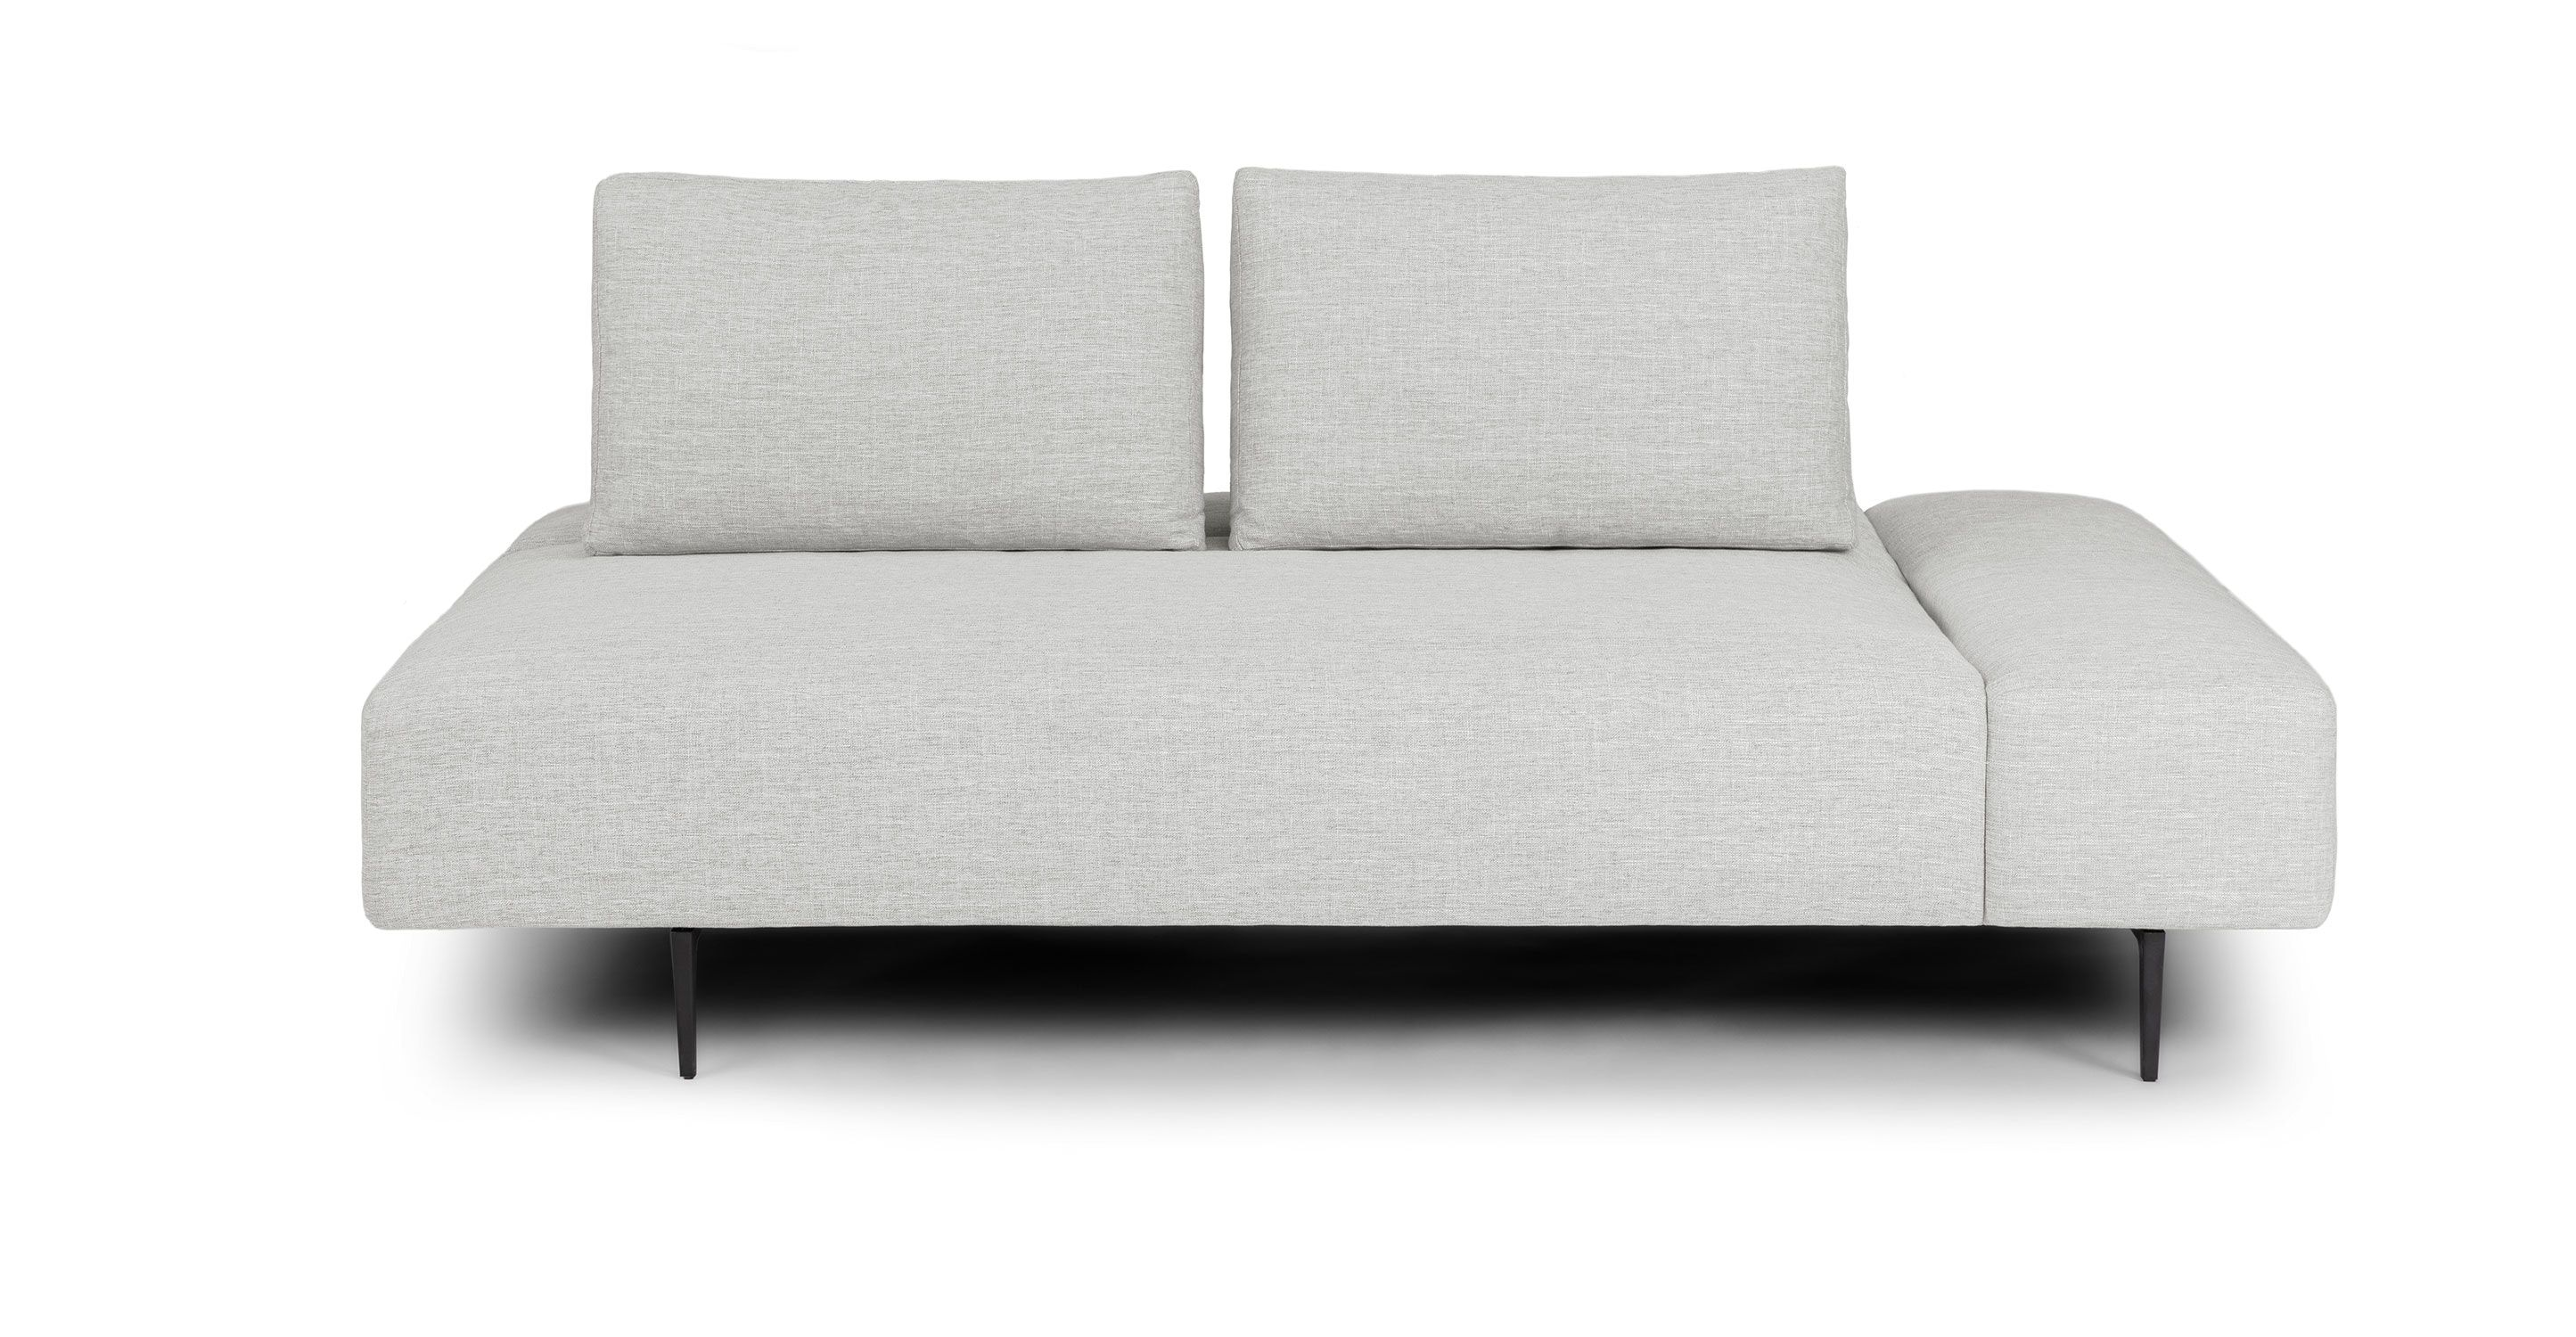 Divan Mist Gray Daybed Daybed Mid Century Modern Sofa Grey